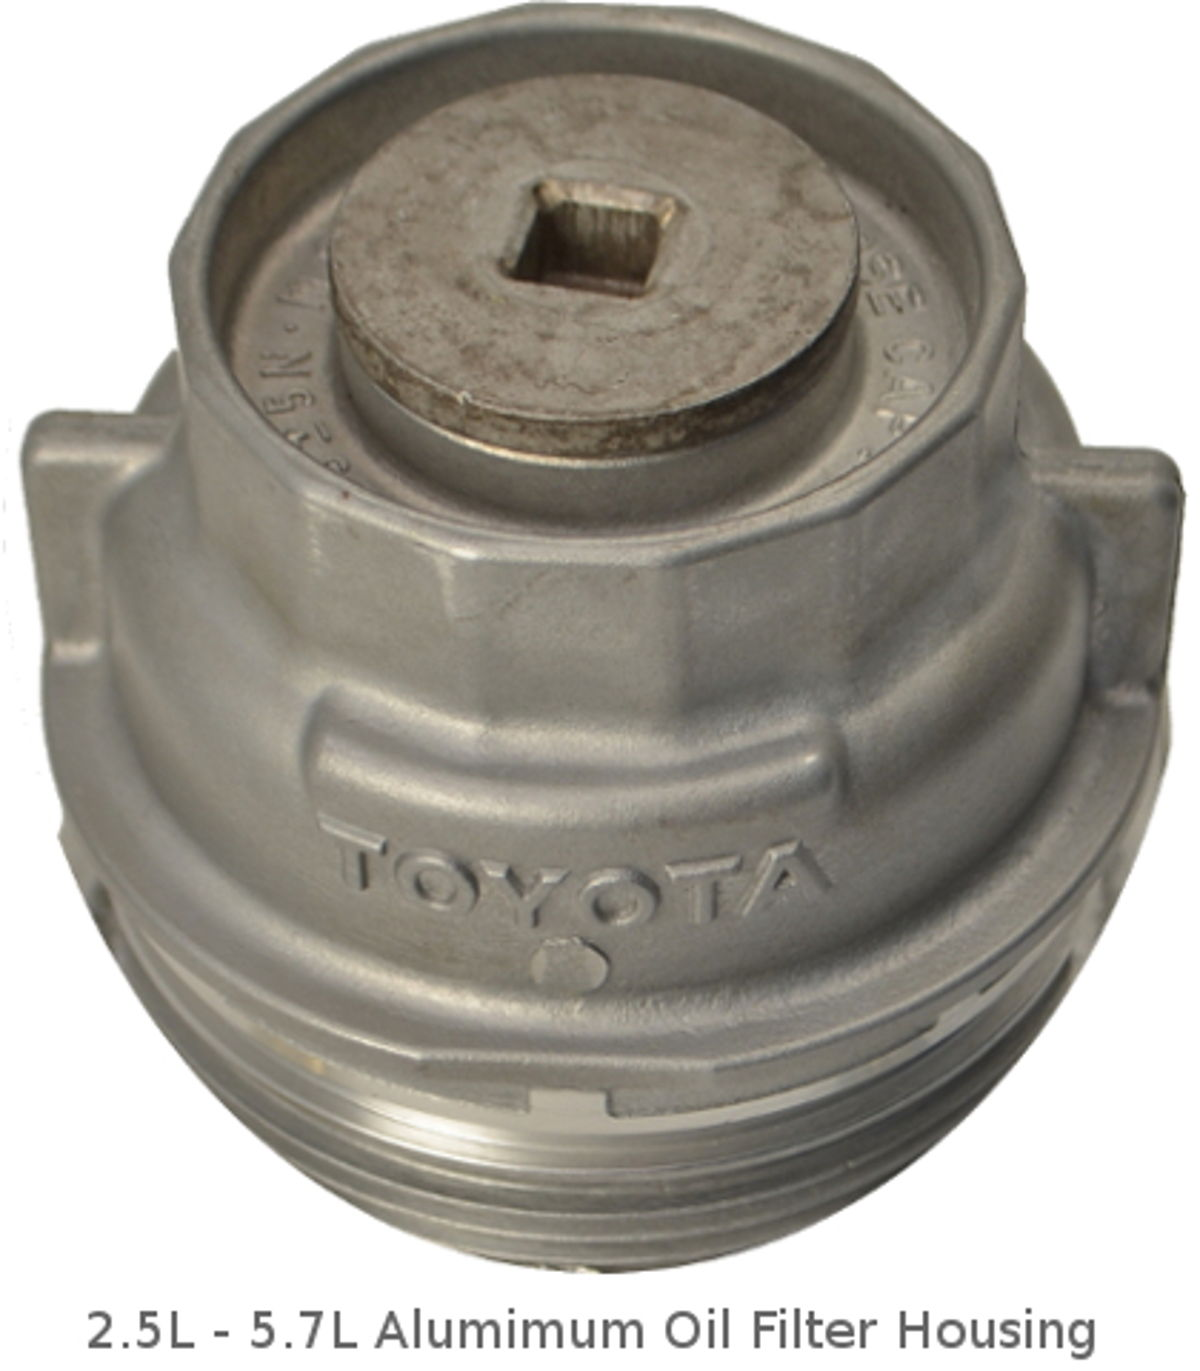 hight resolution of 2 5l 5 7l toyota aluminum oil filter housing